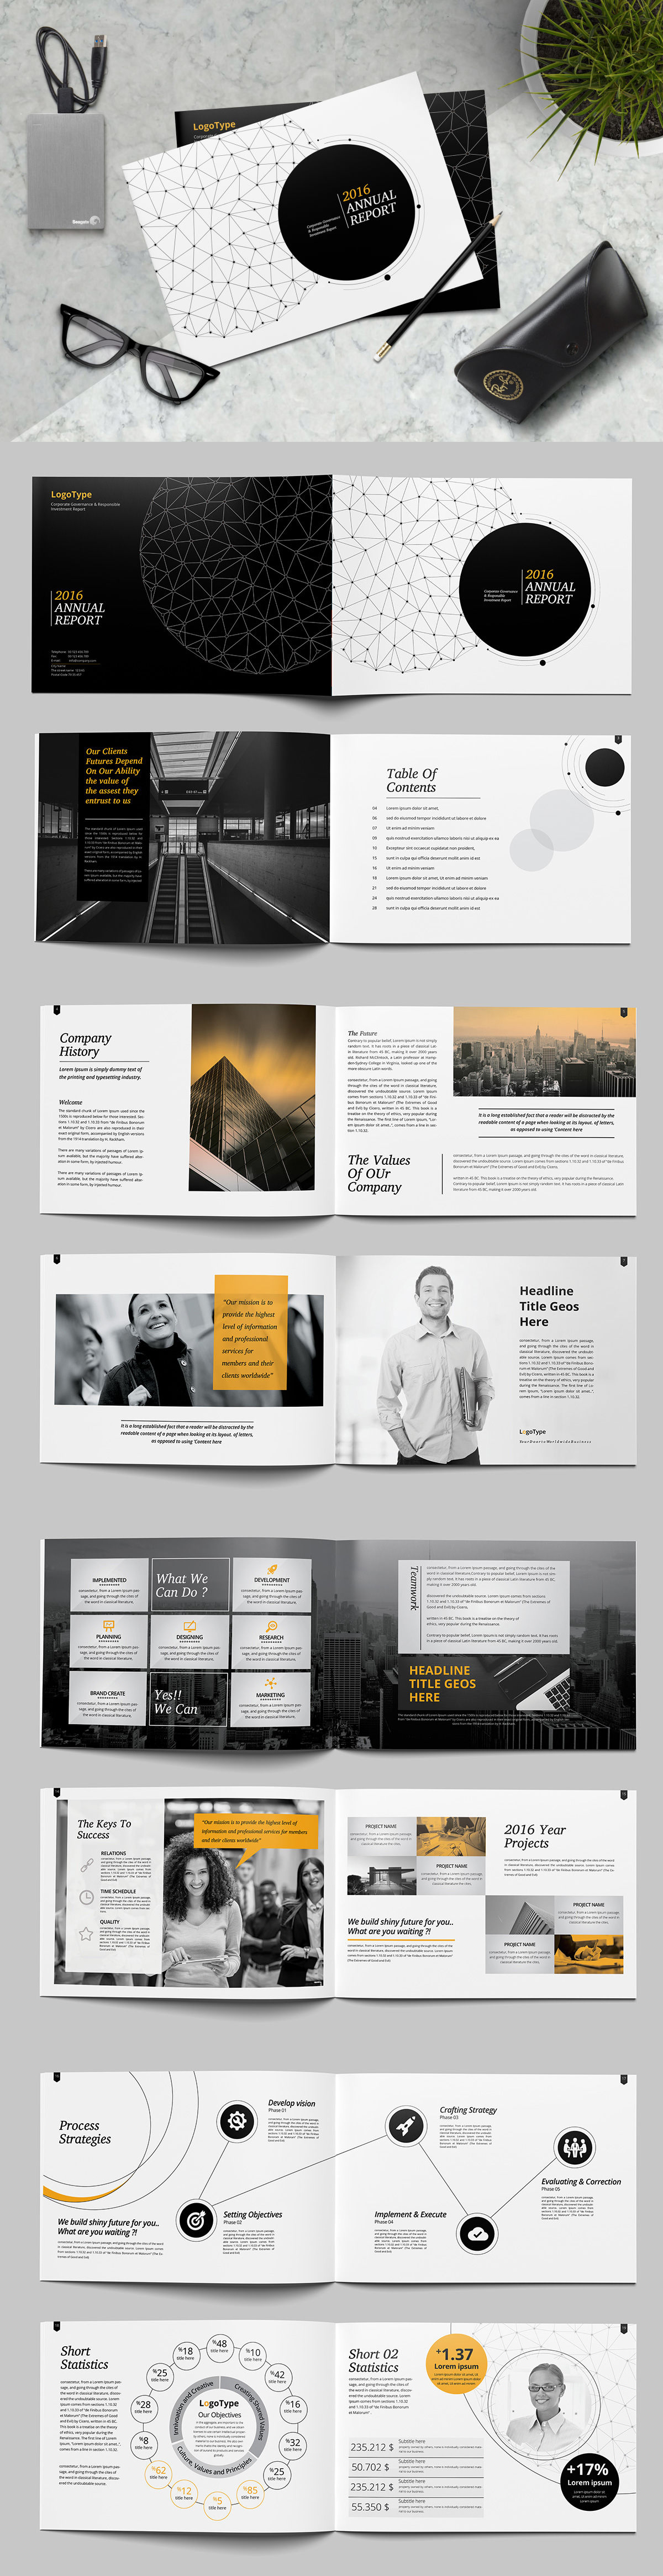 Landscape Annual Report Brochure Template InDesign INDD   Design ...